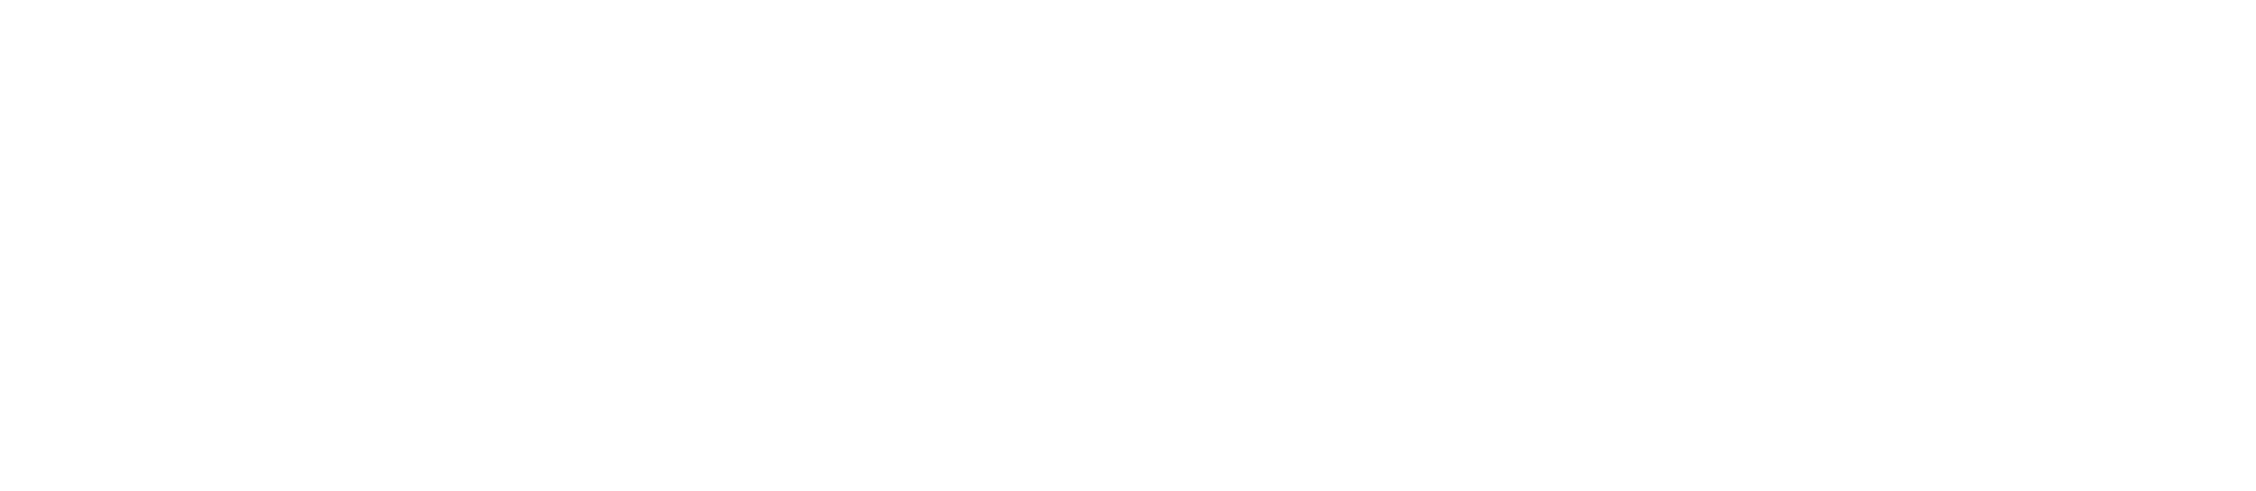 logo latentransport-aufzug